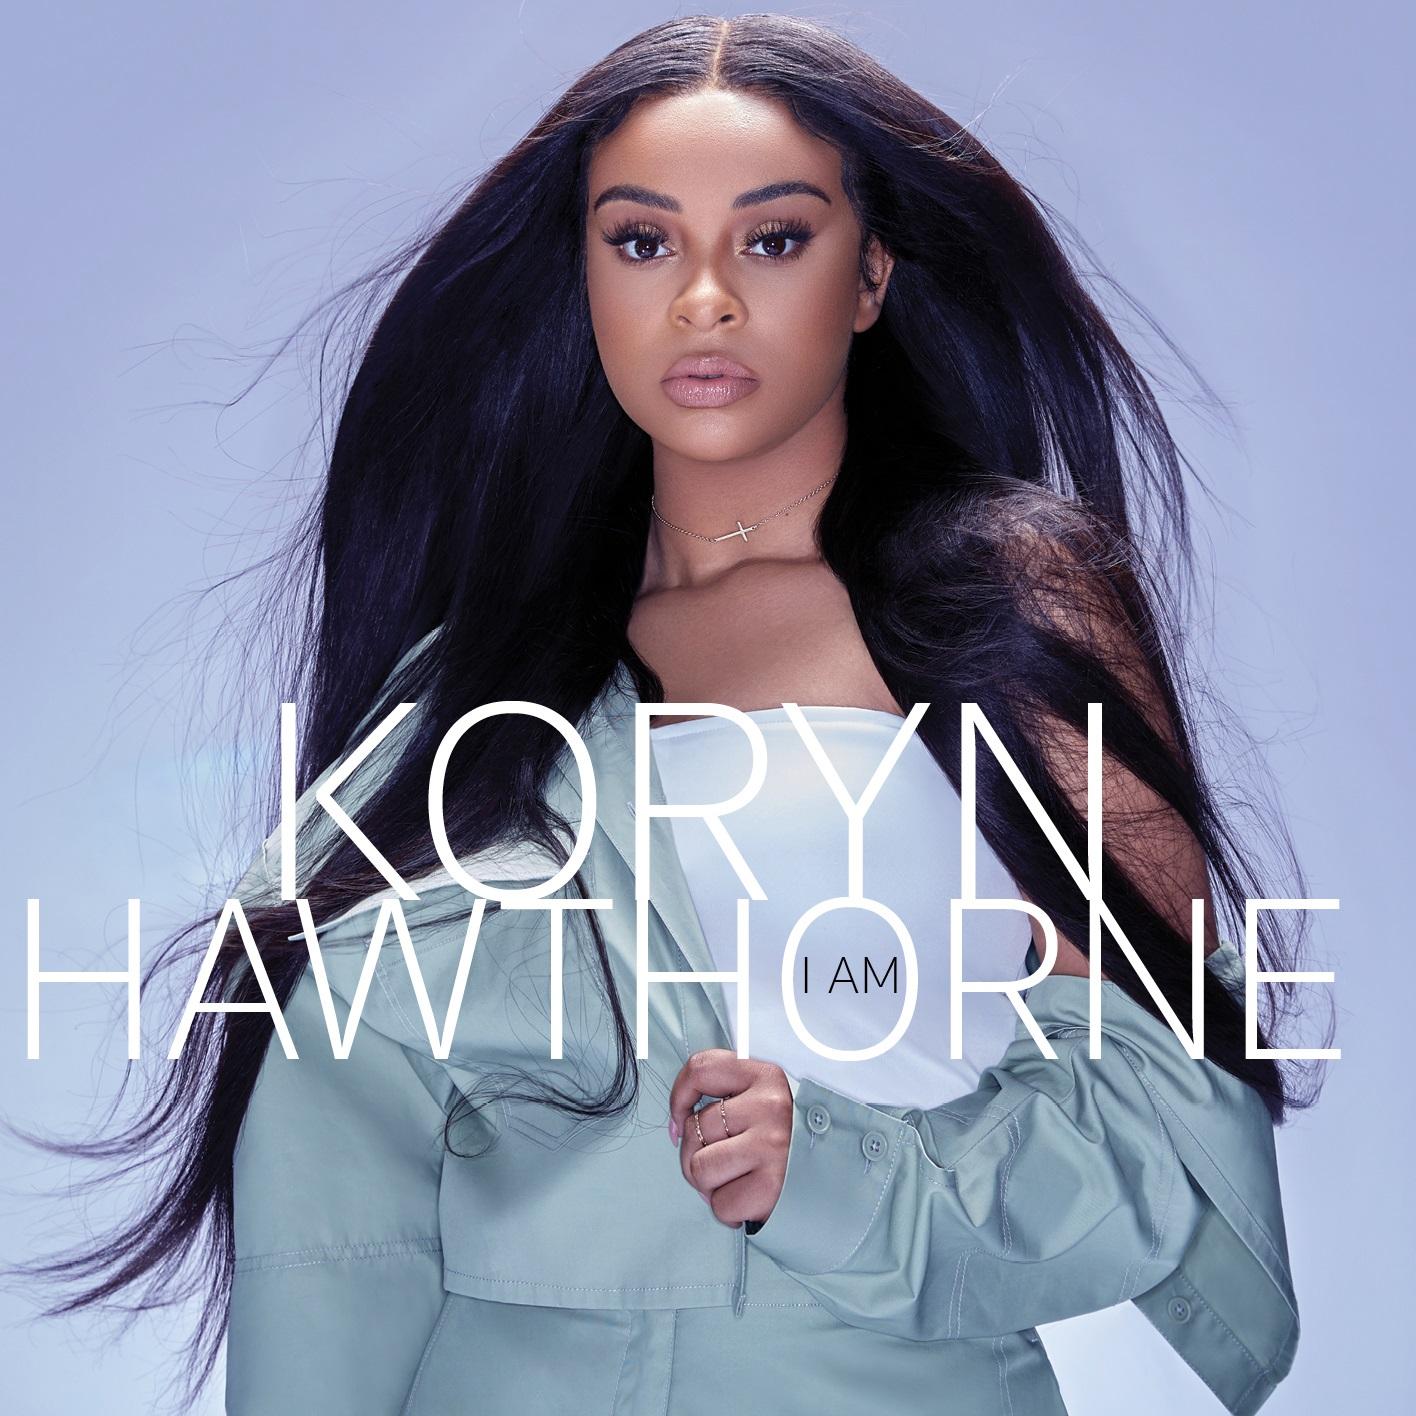 Speak-To-Me-Koryn-Hawthorne [Video] Speak To Me – Koryn Hawthorne